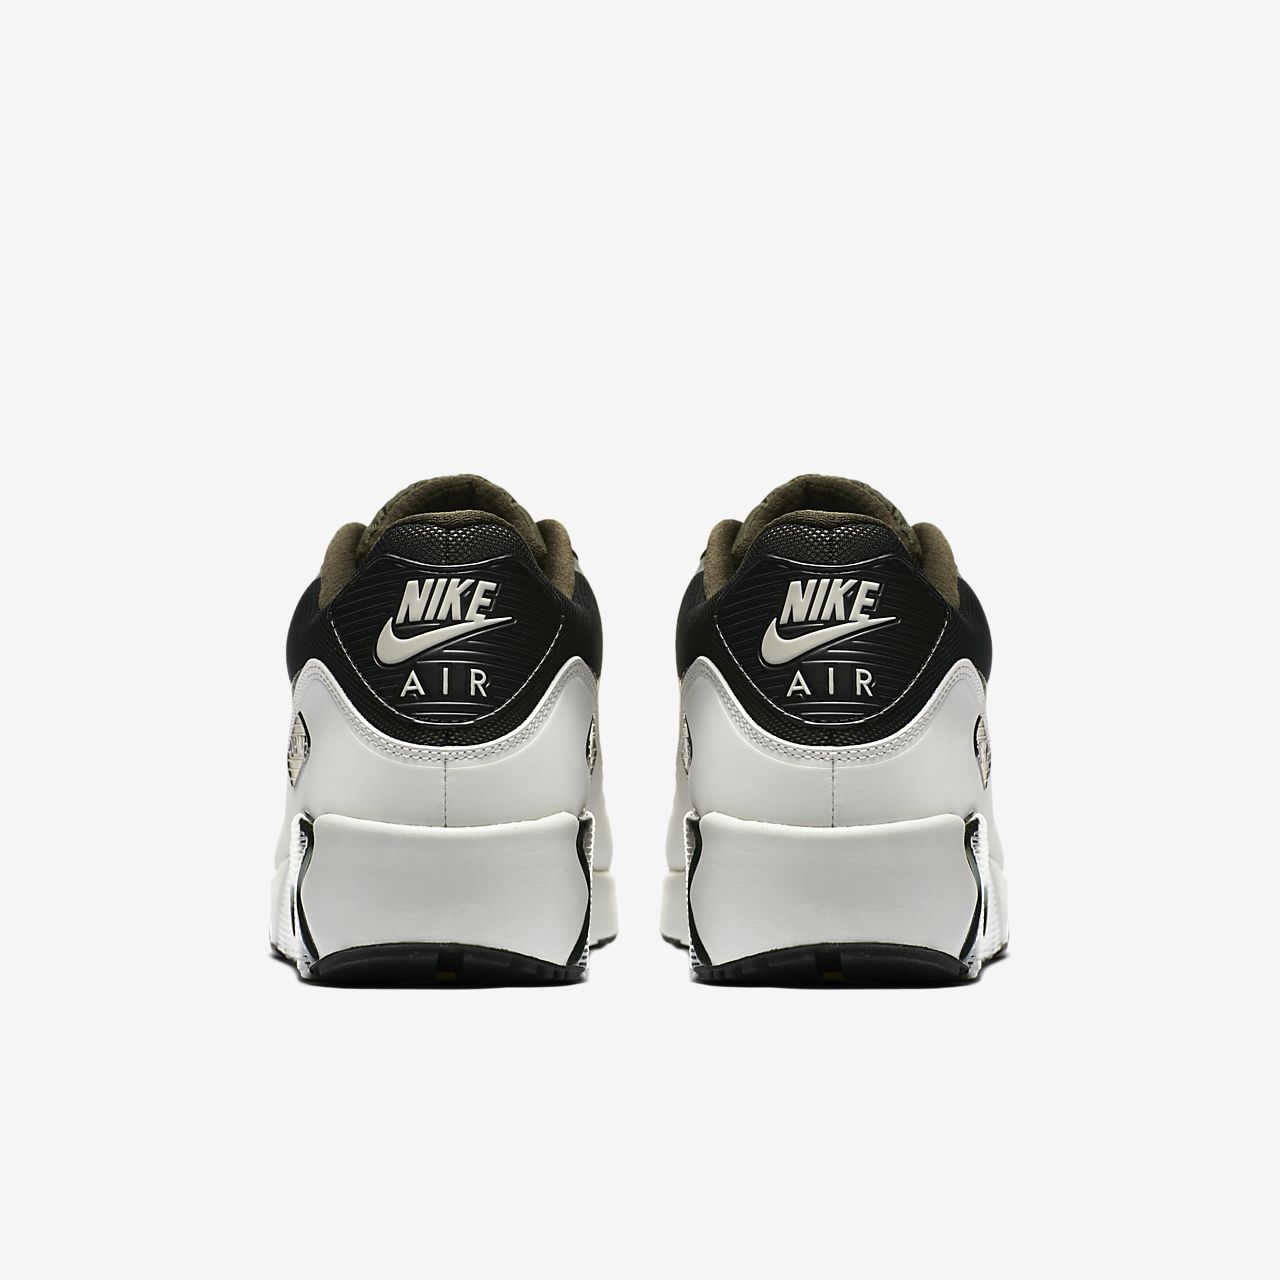 nike air max 90 ultra se men's shoe